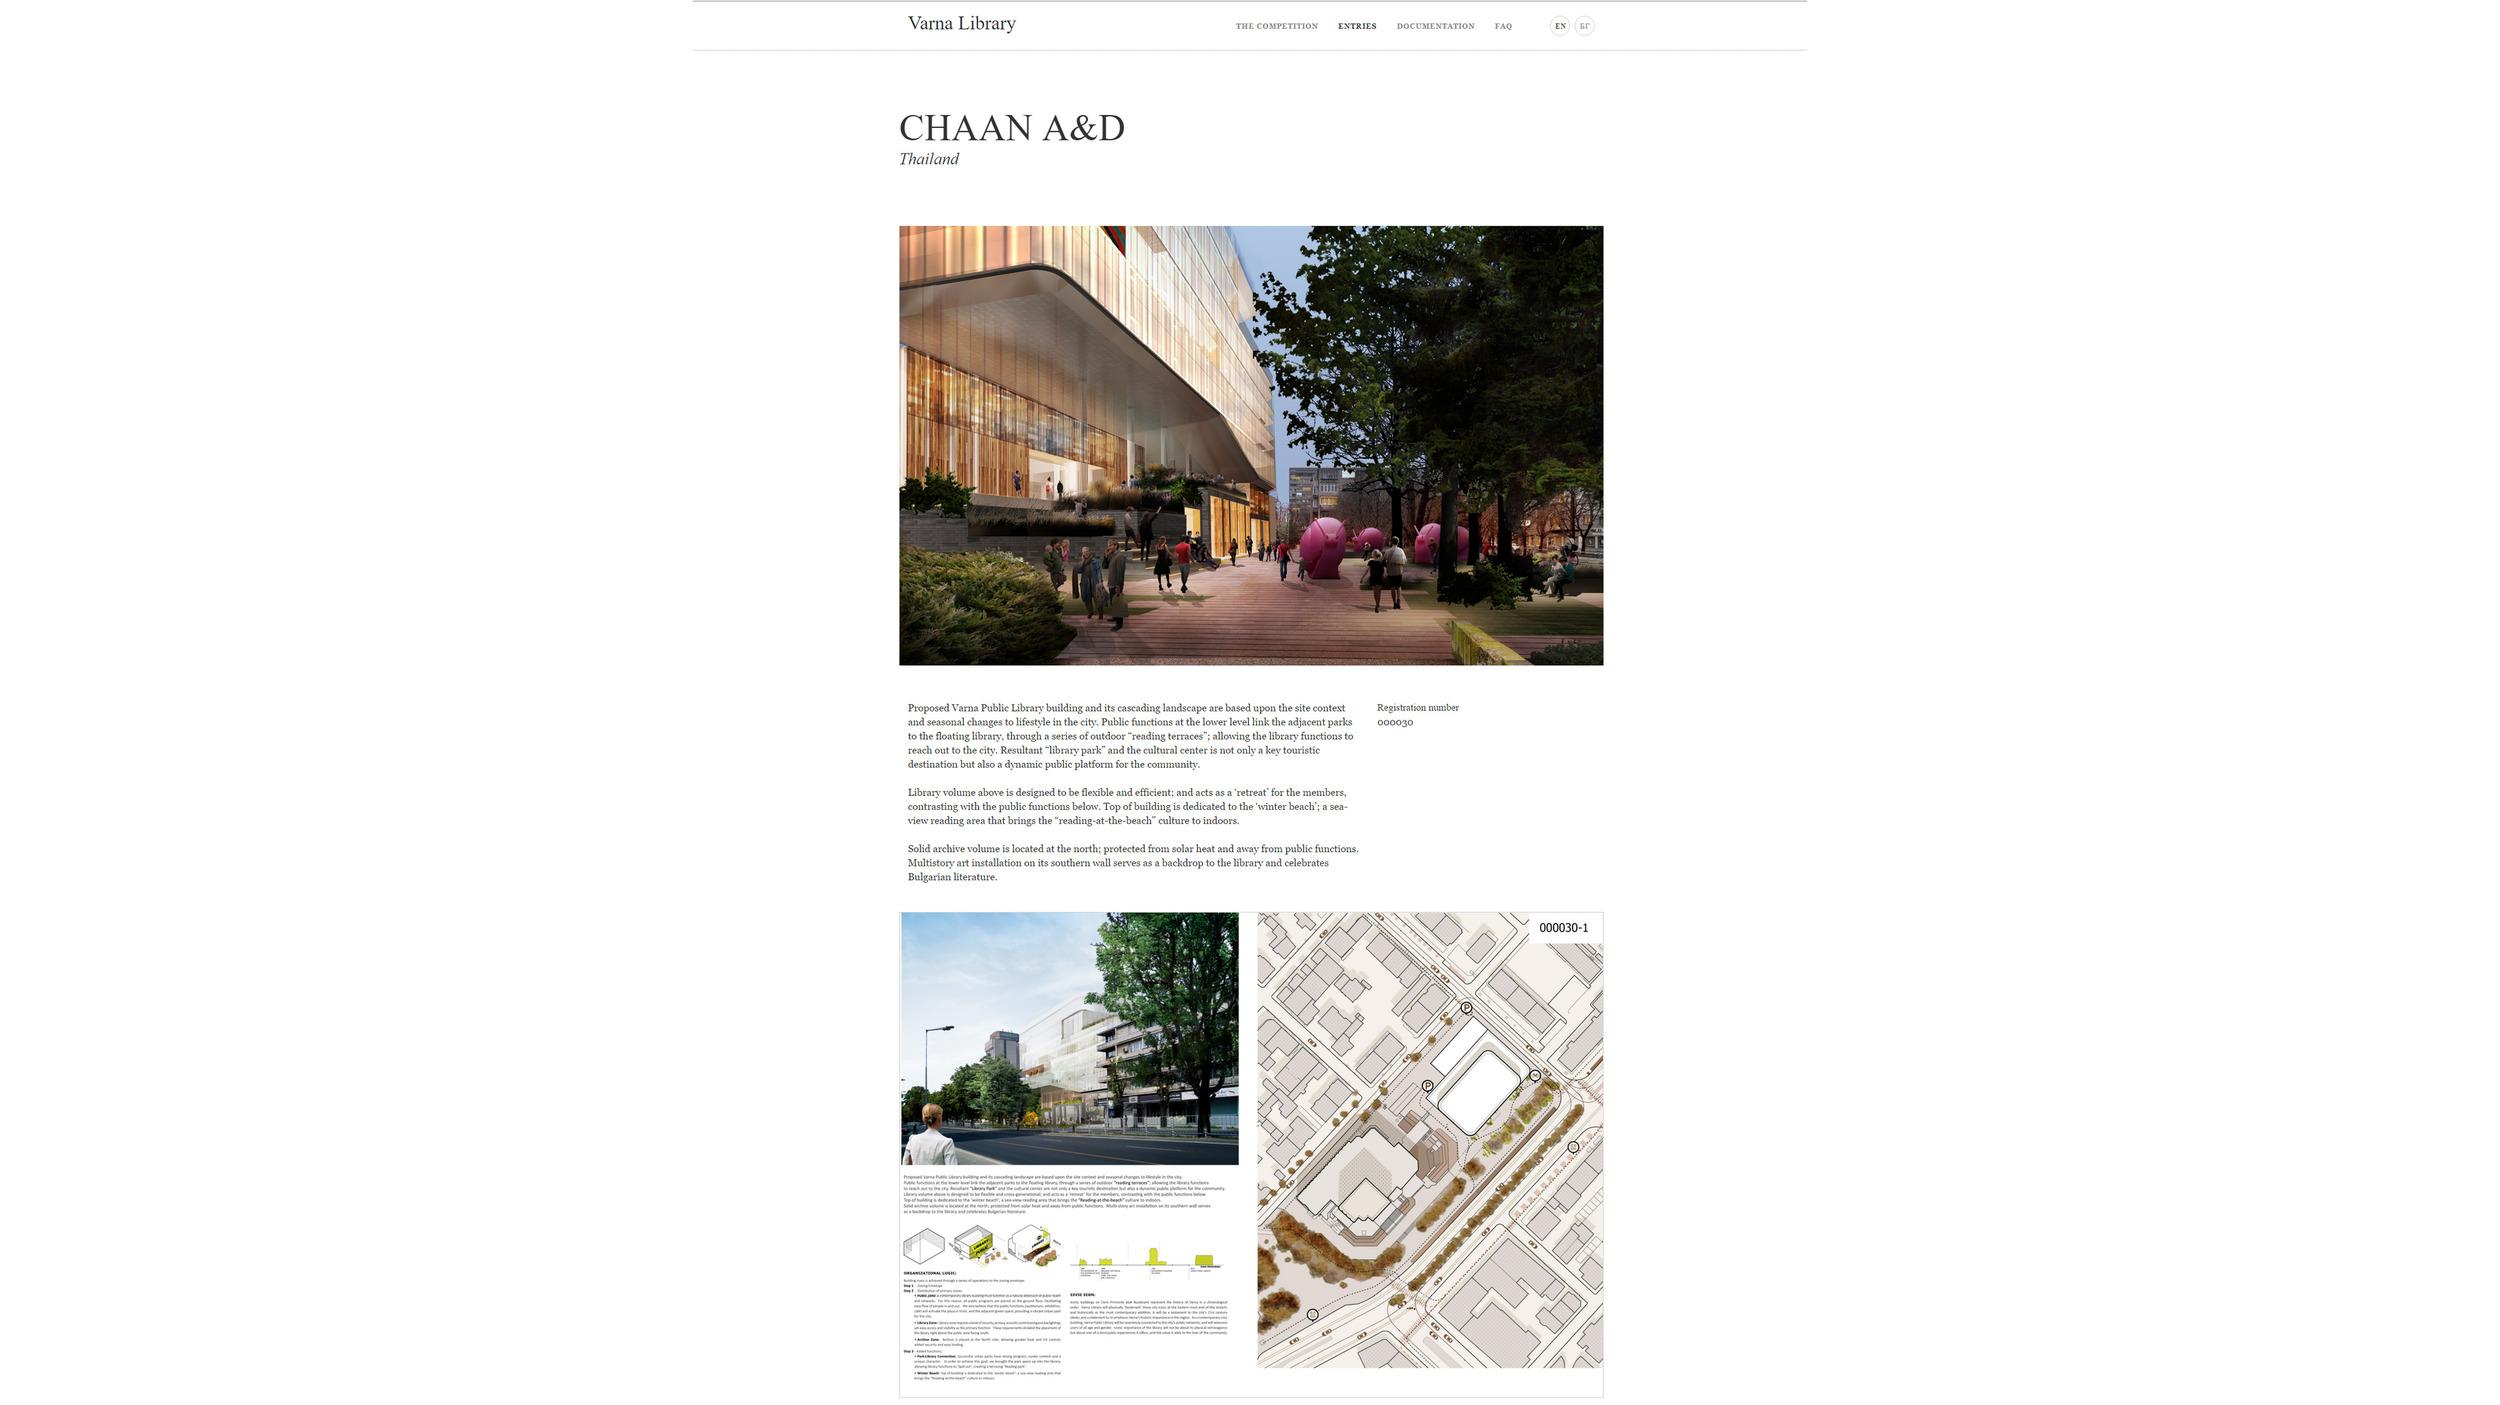 varna_site15.jpg